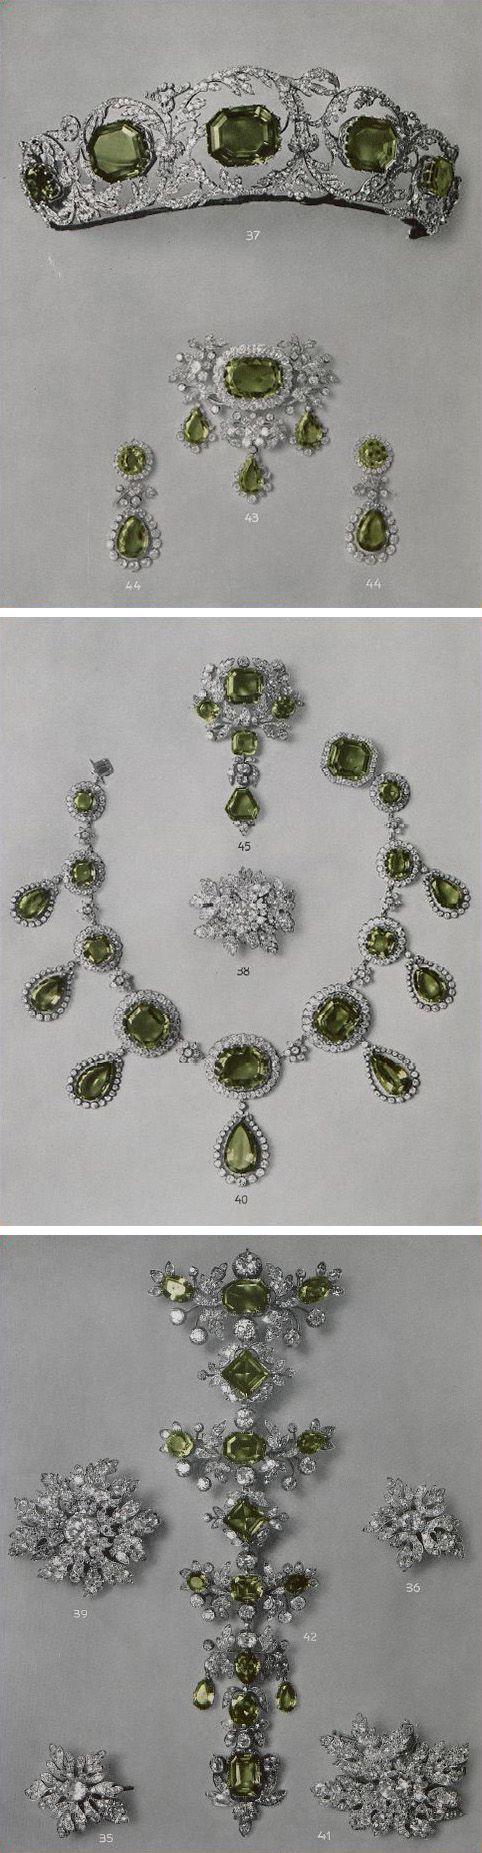 bijoux anciennes 81fcad10